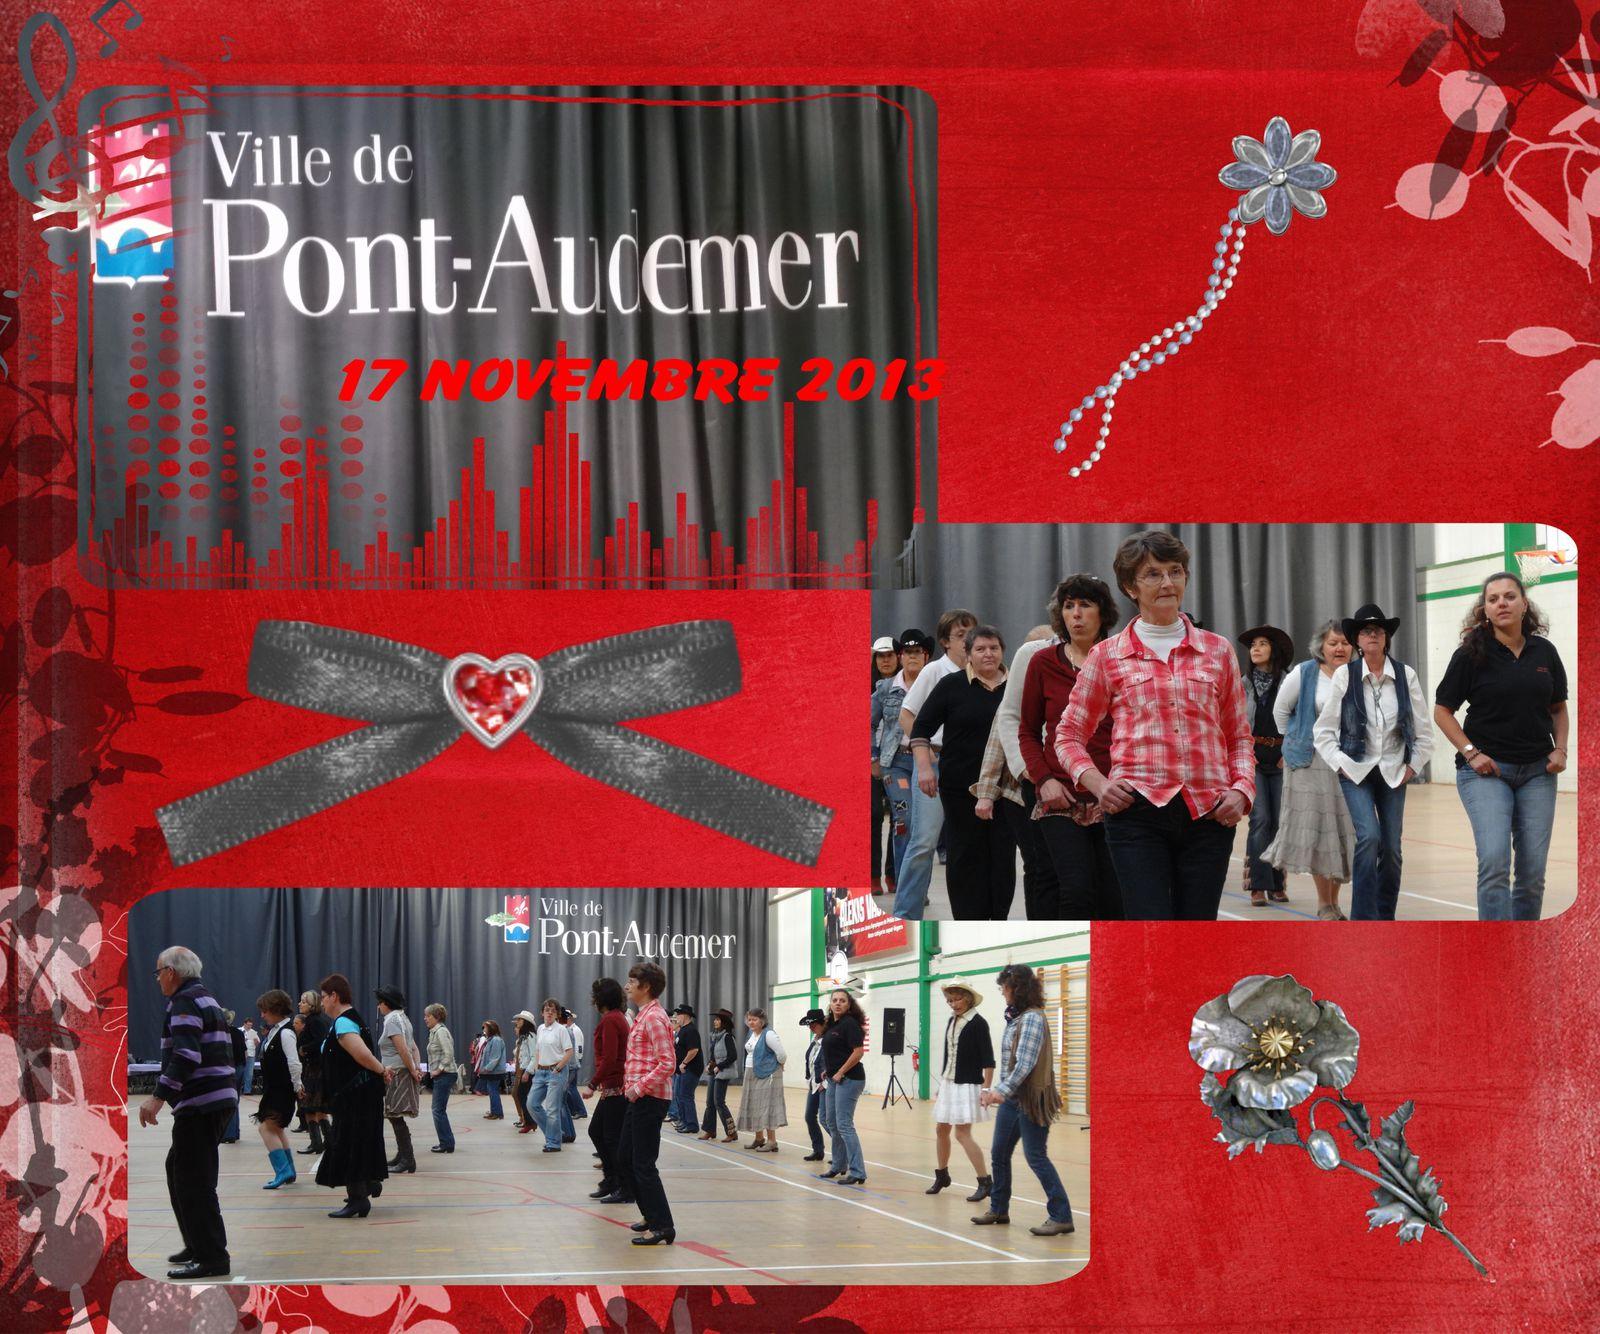 Pont-audemer 2013